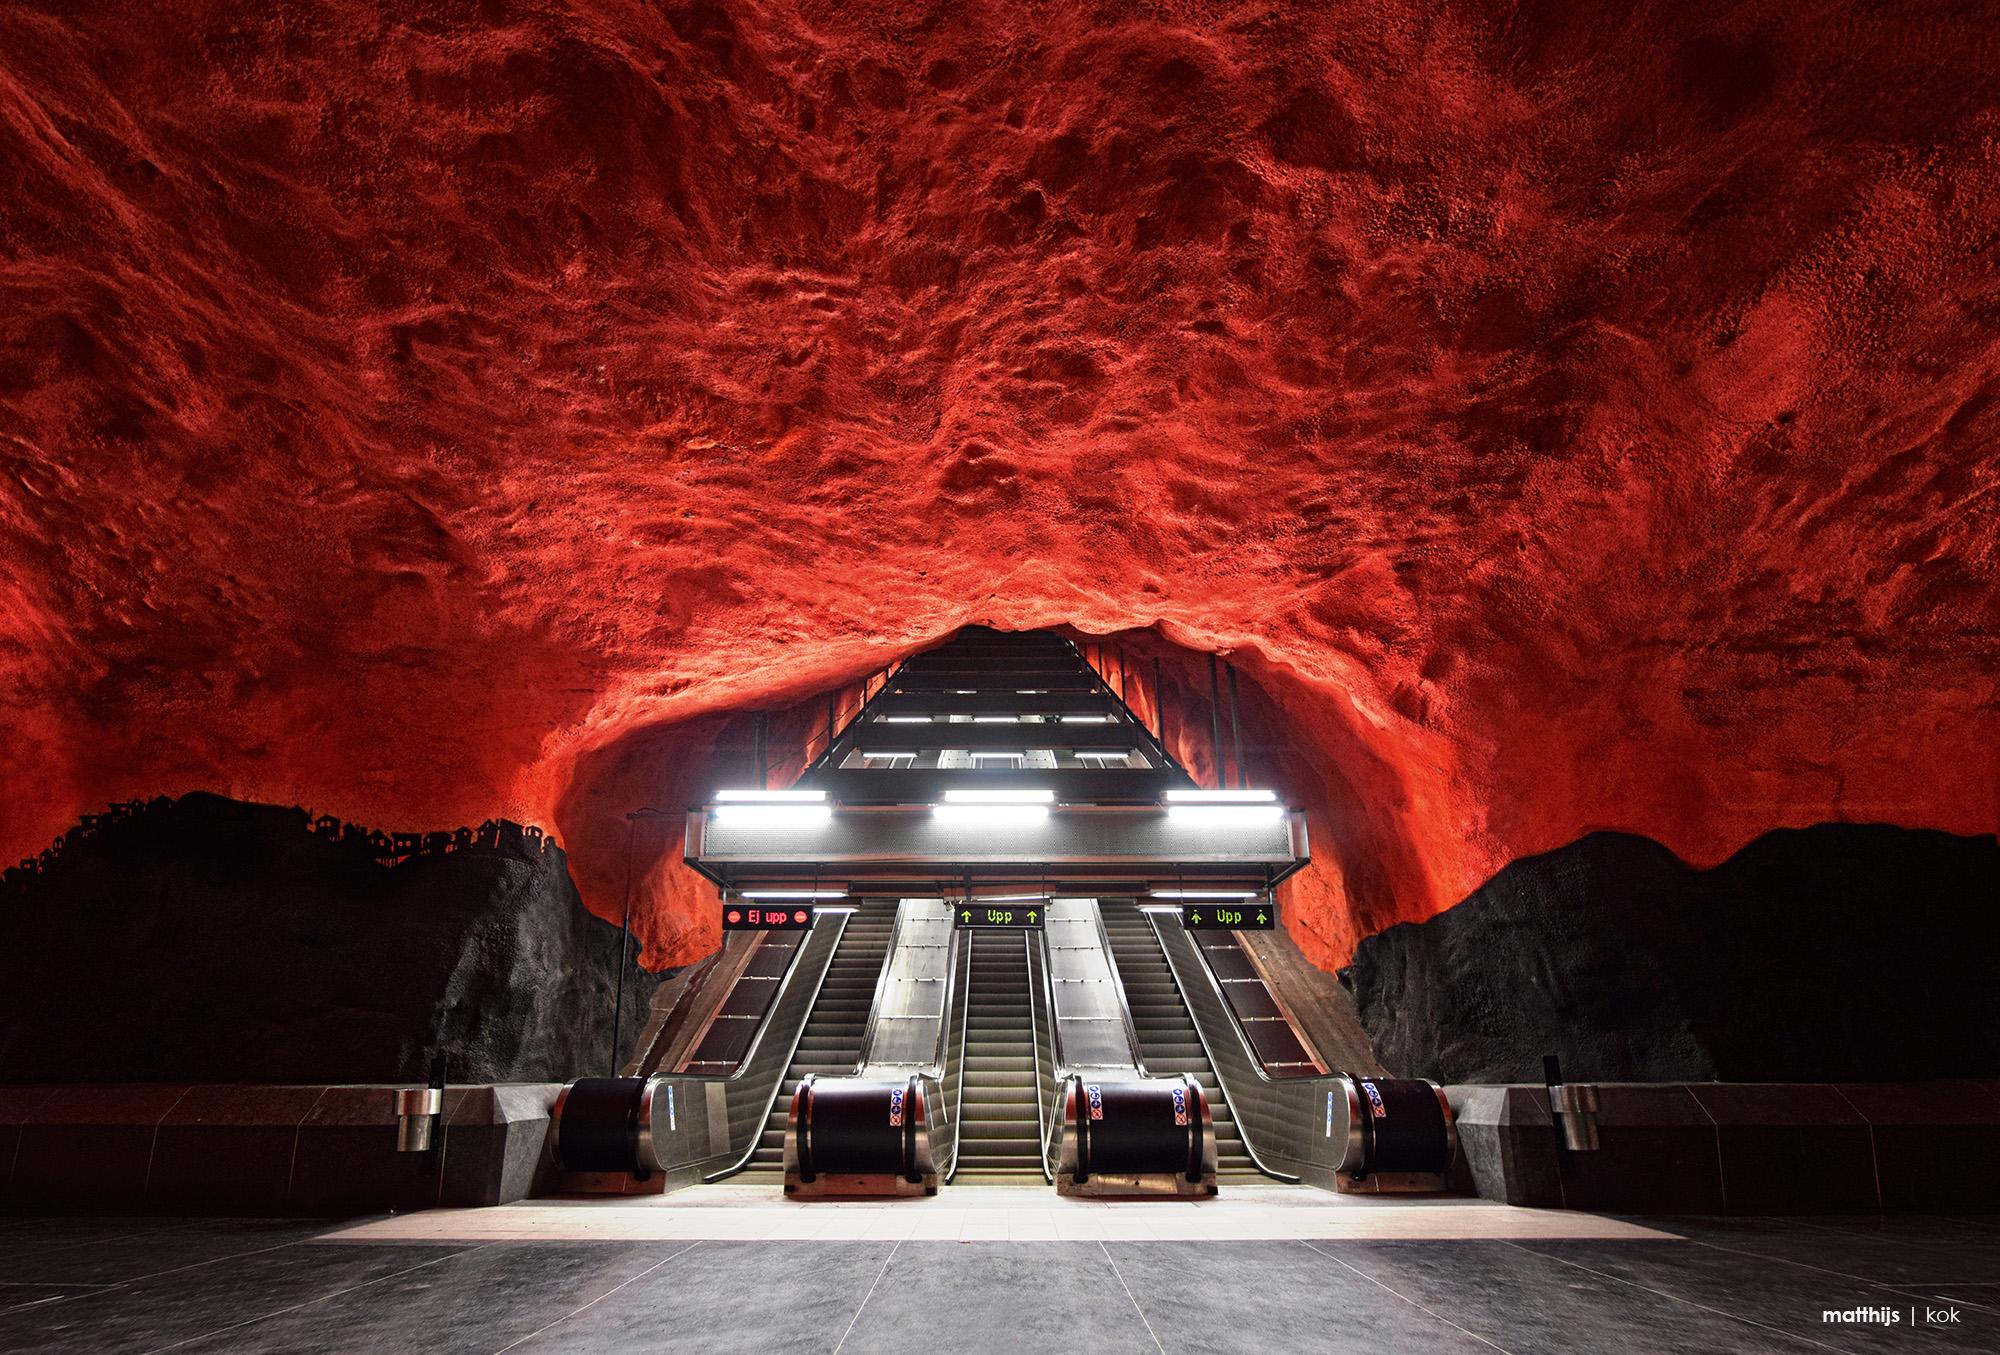 Solna Subway Station, Stockholm, Sweden | Photo by Matthijs Kok